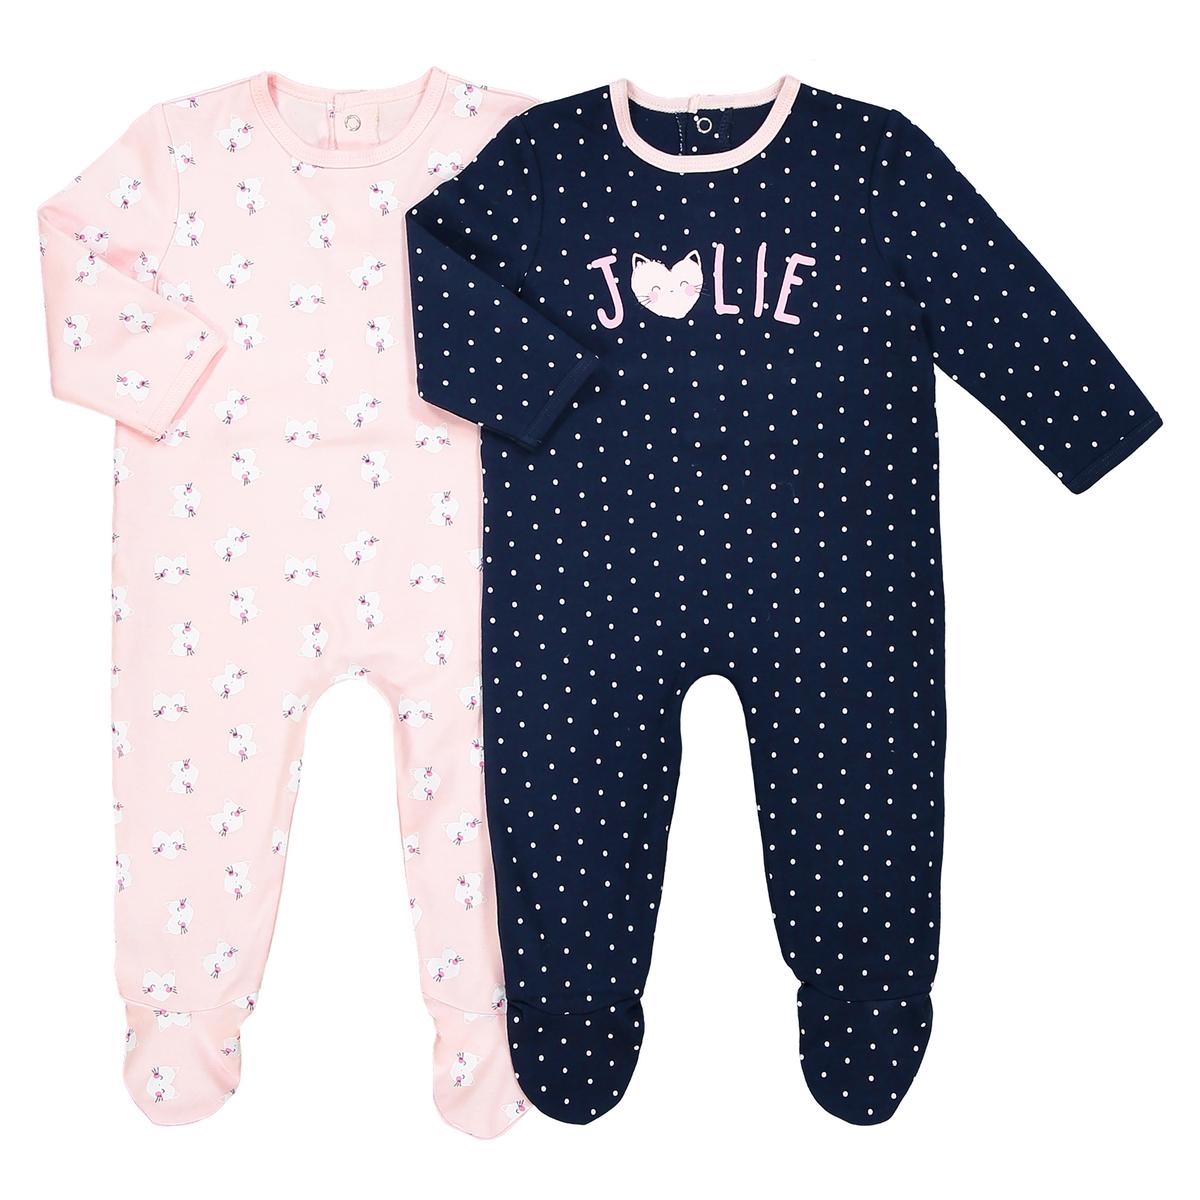 Confezione da 2 pigiama in cotone da 0 mesi a 3 anni Oeko Tex